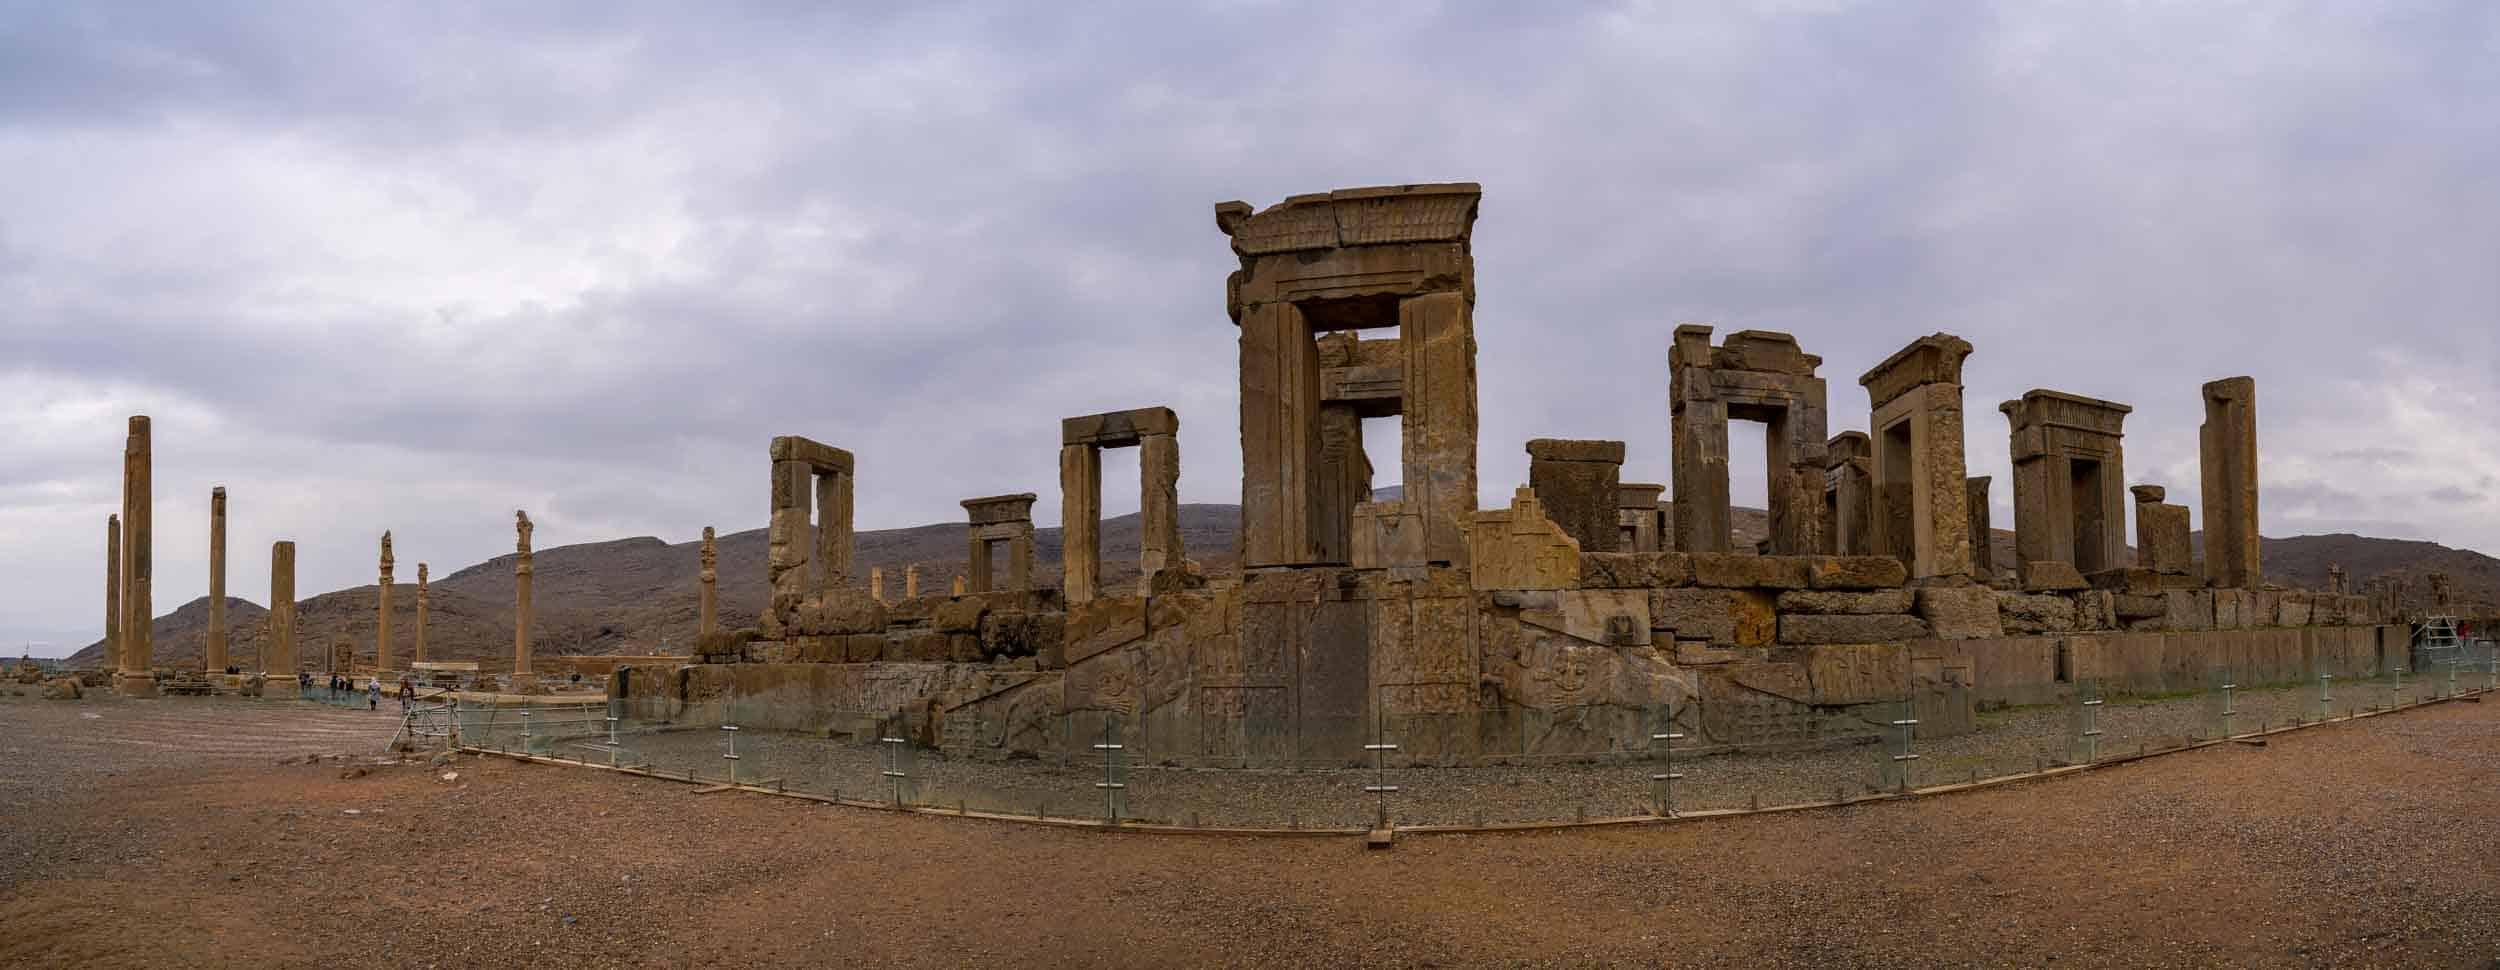 The main temple inside Persepolis in Iran